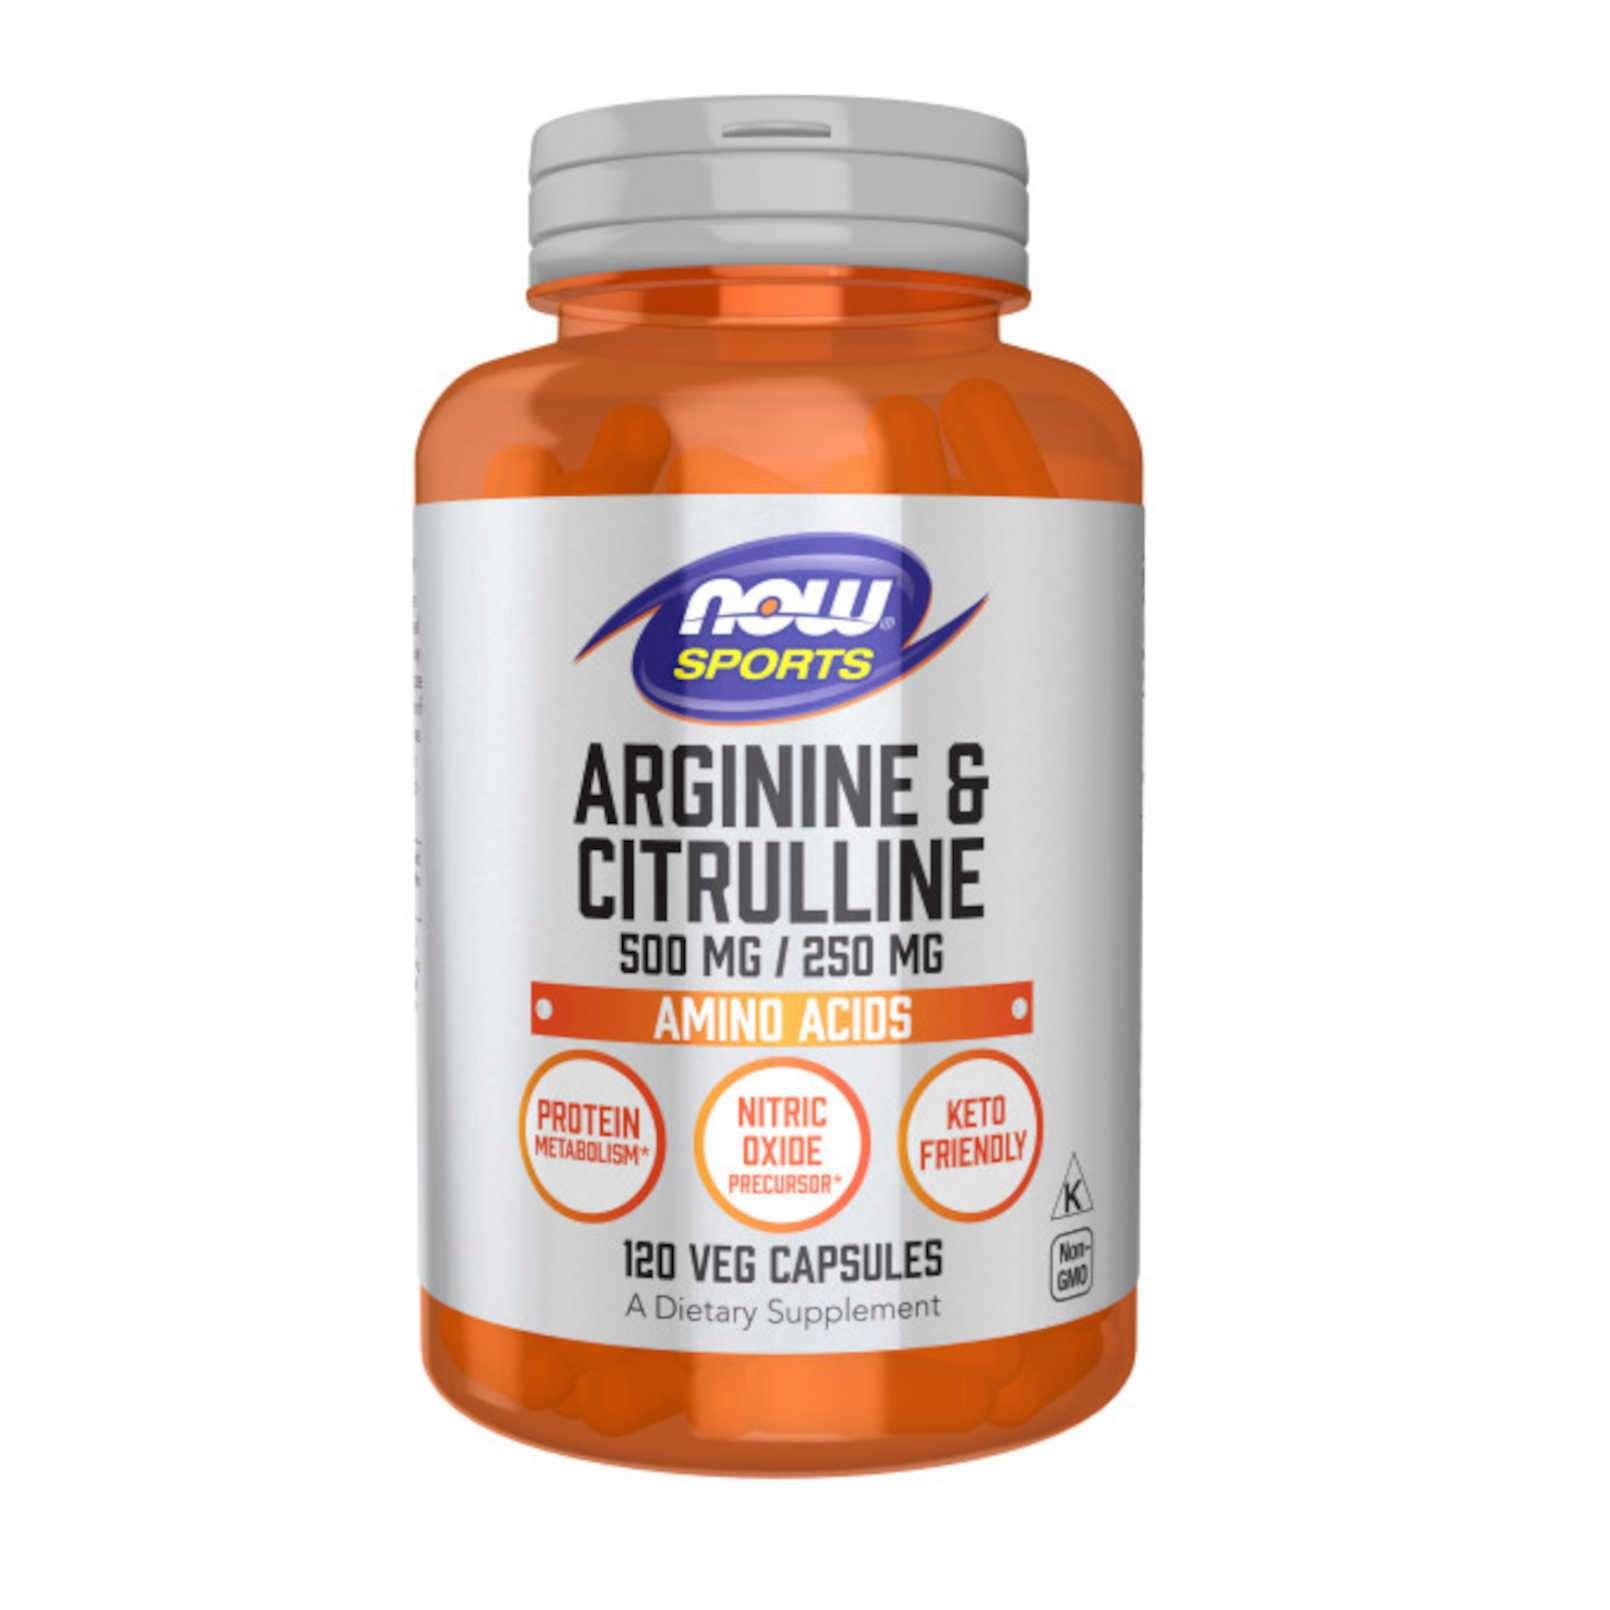 ARGININ & CITRULLIN 500 mg / 250 mg - 120 veg caps